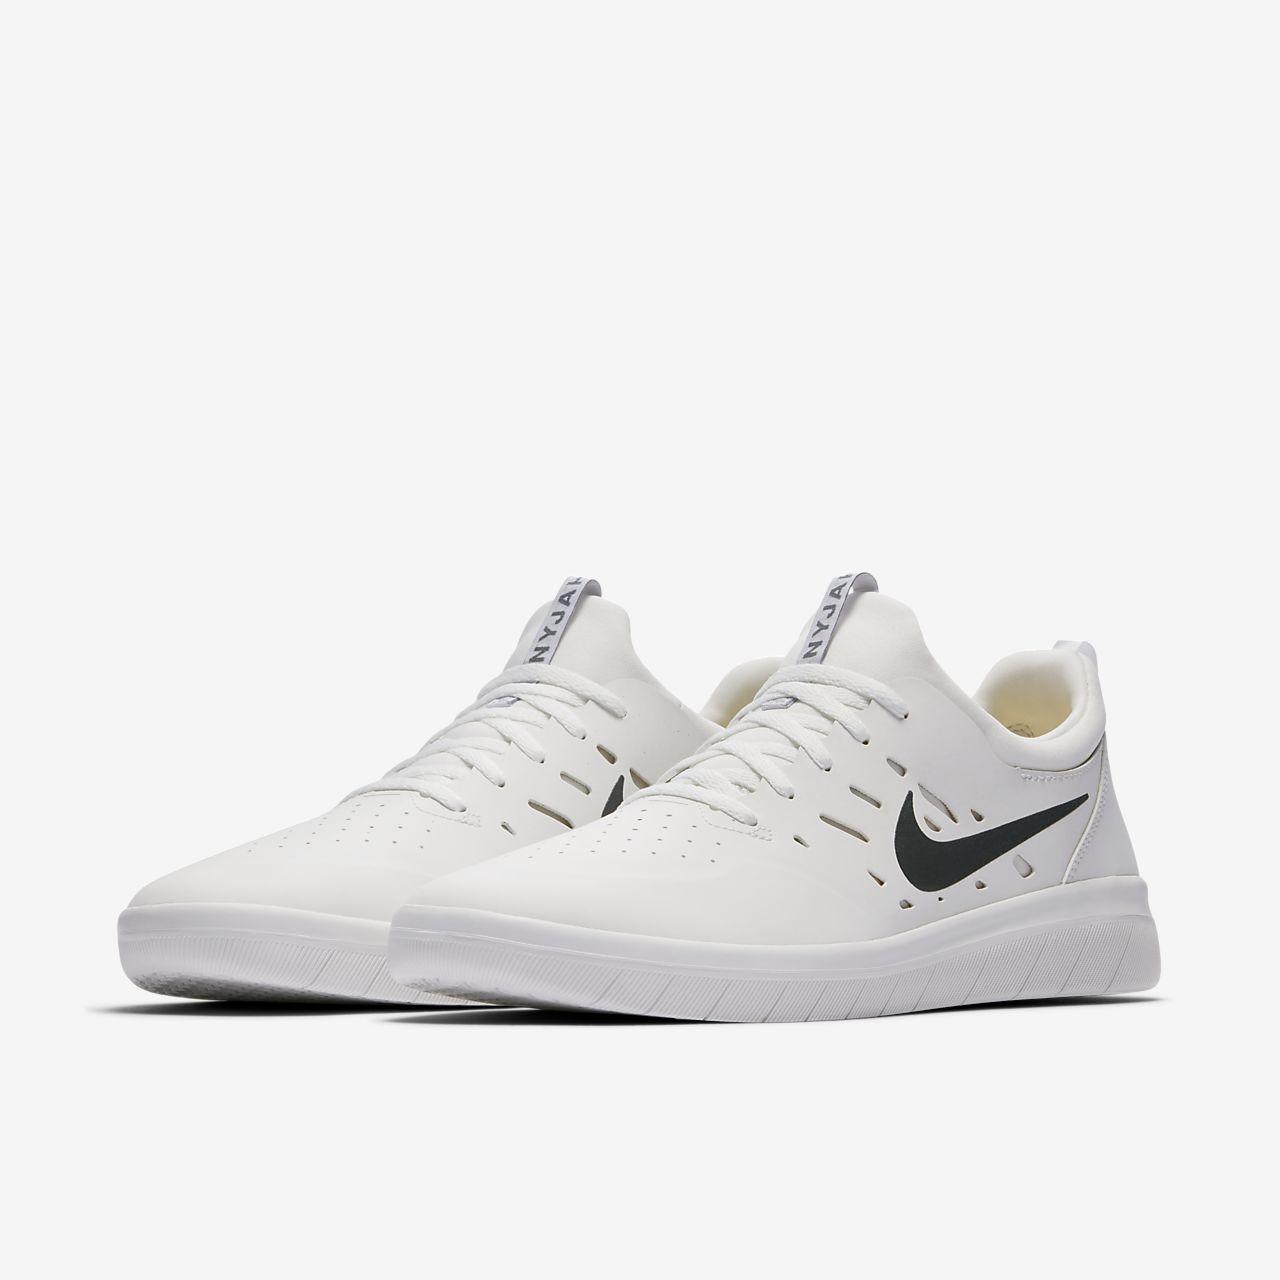 2240dbd7c85d Nike SB Nyjah Free Skate Shoe. Nike.com GB